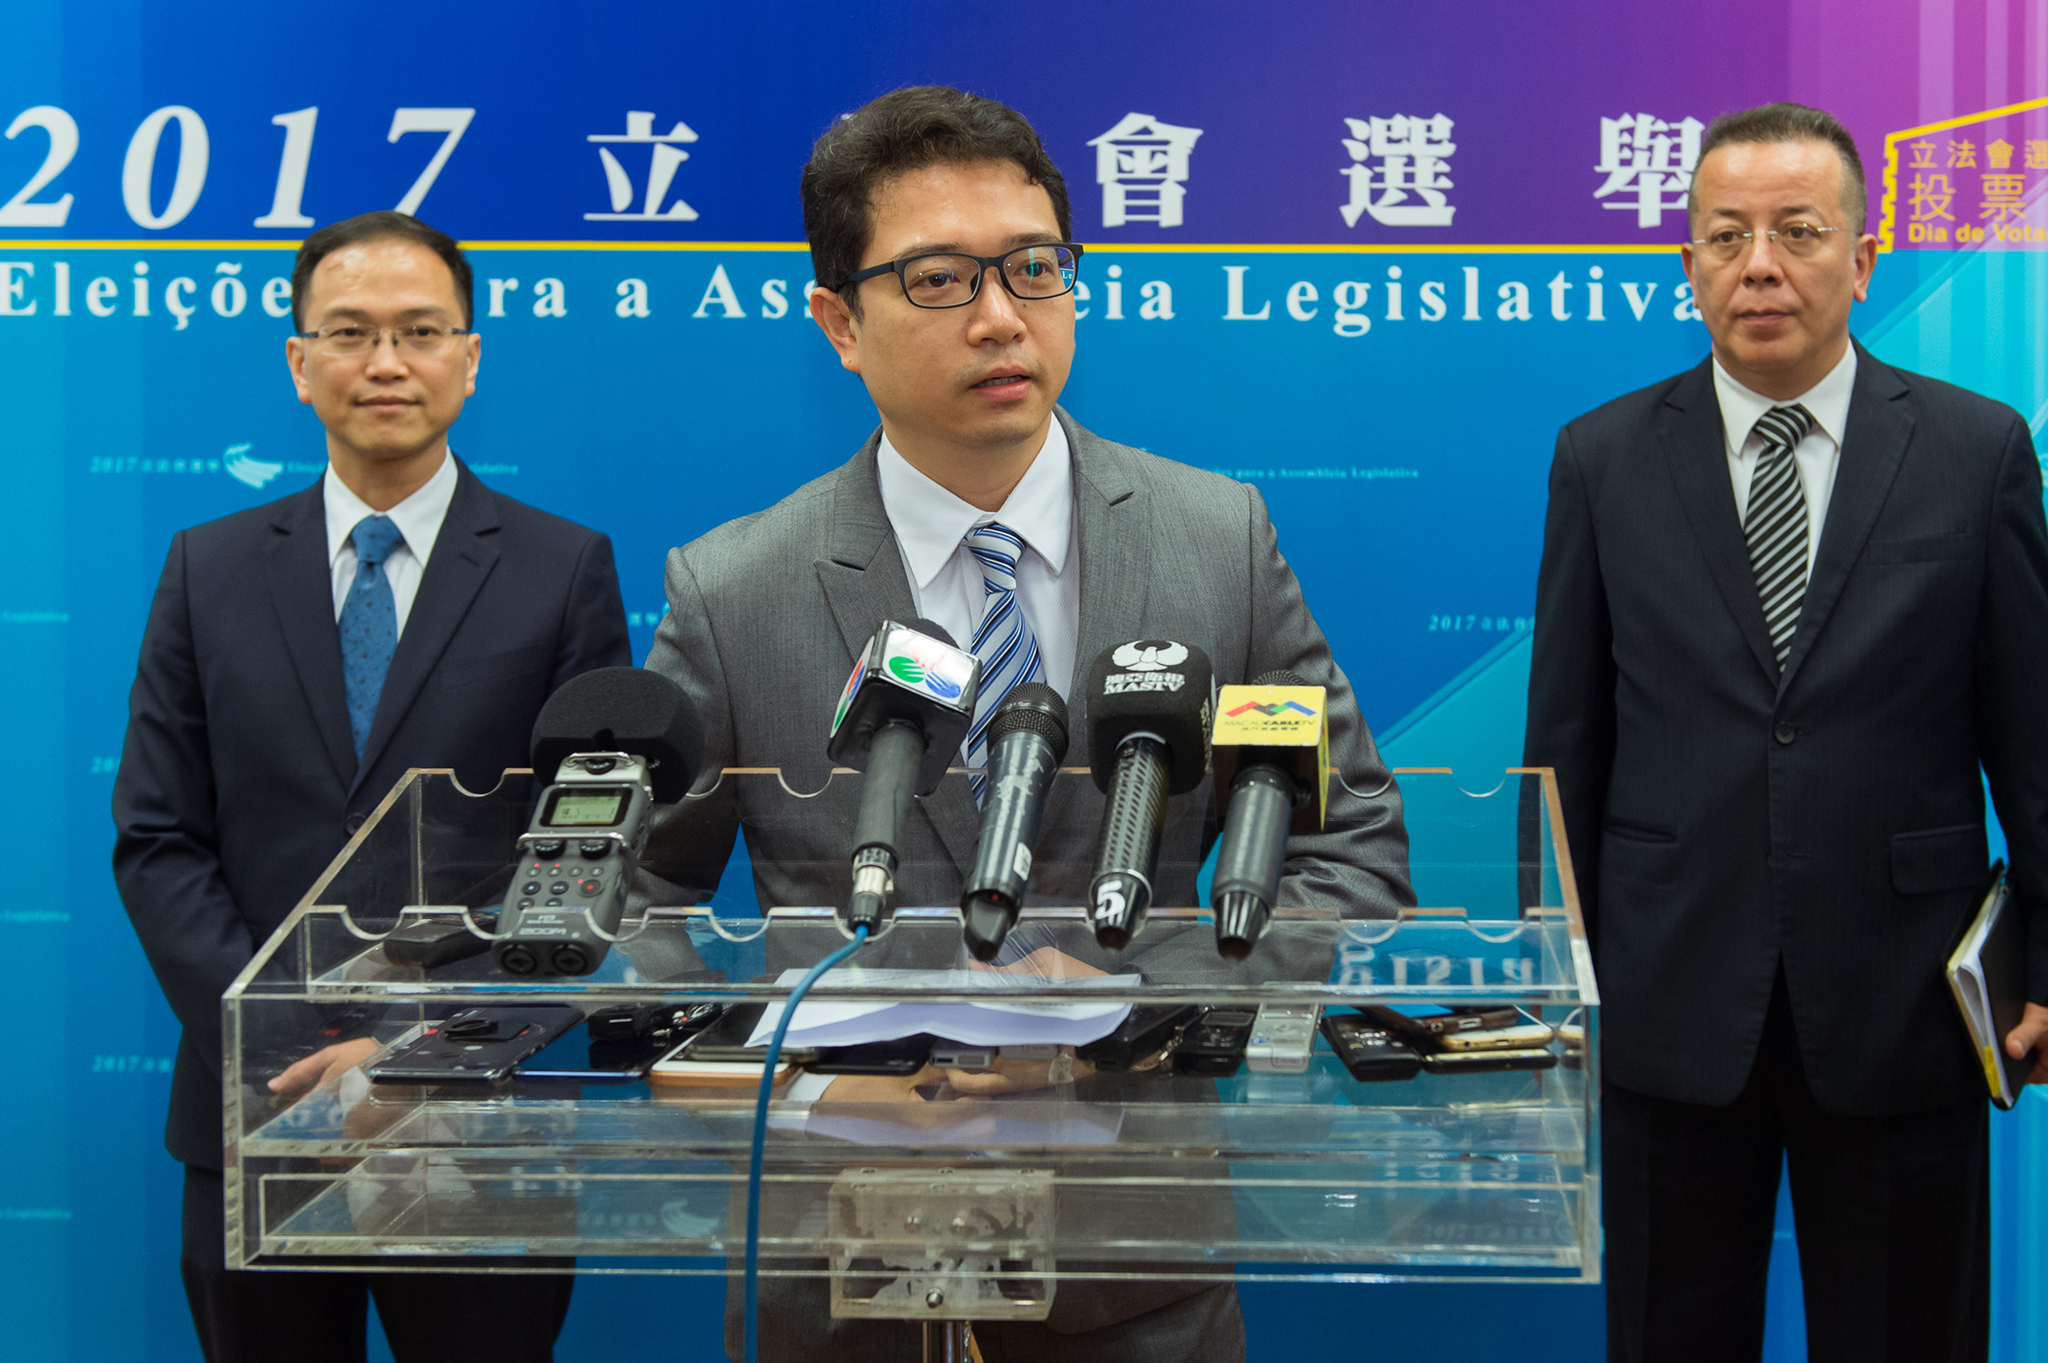 Novo Macau | Queixa na CAEAL por alegada infidelidade ao regime